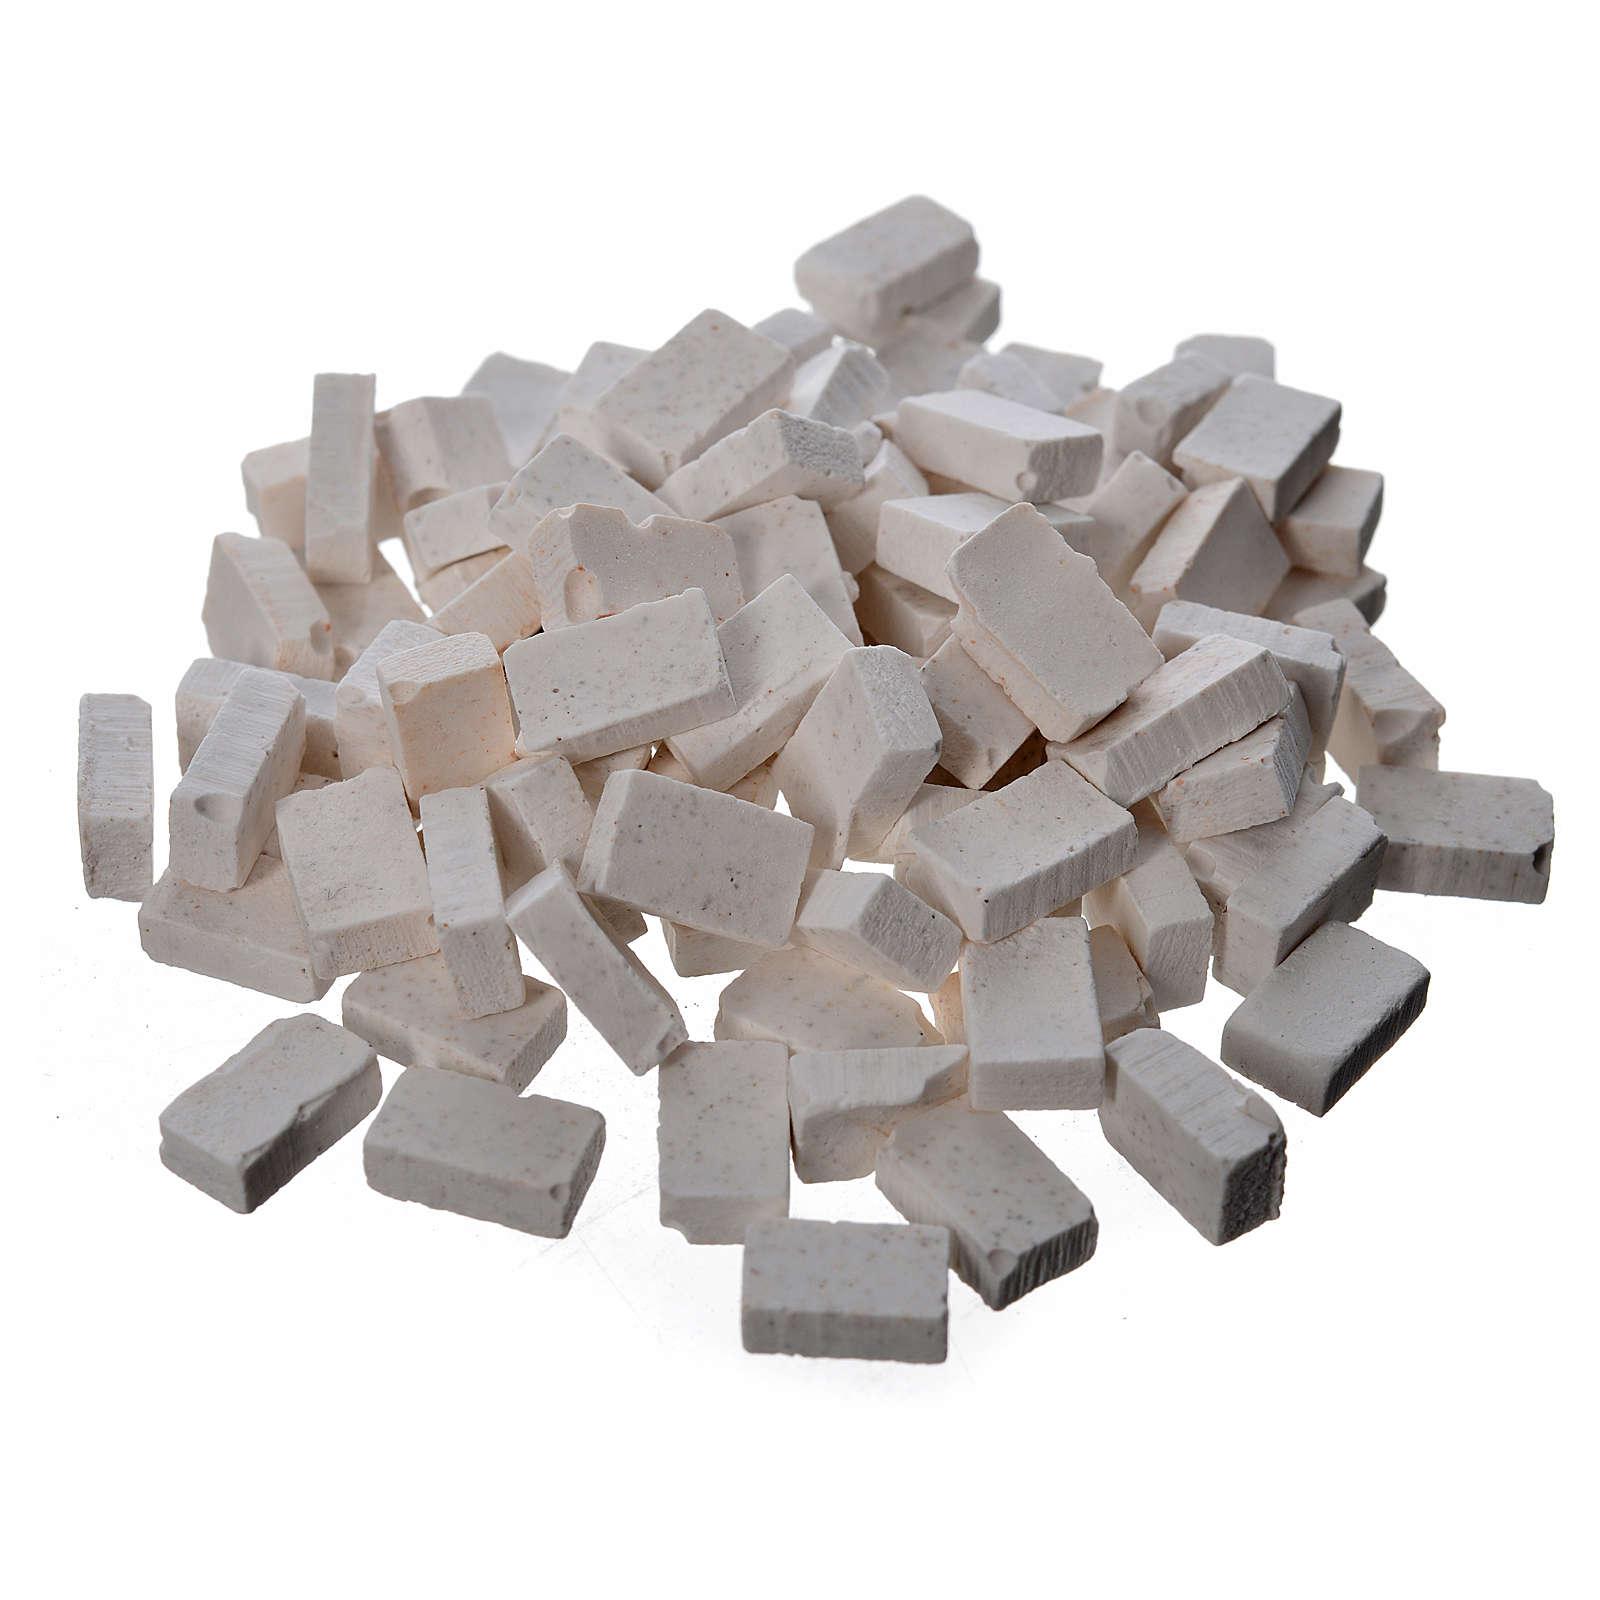 Tijolos cinzentos resina 10x7 mm 100 peças 4